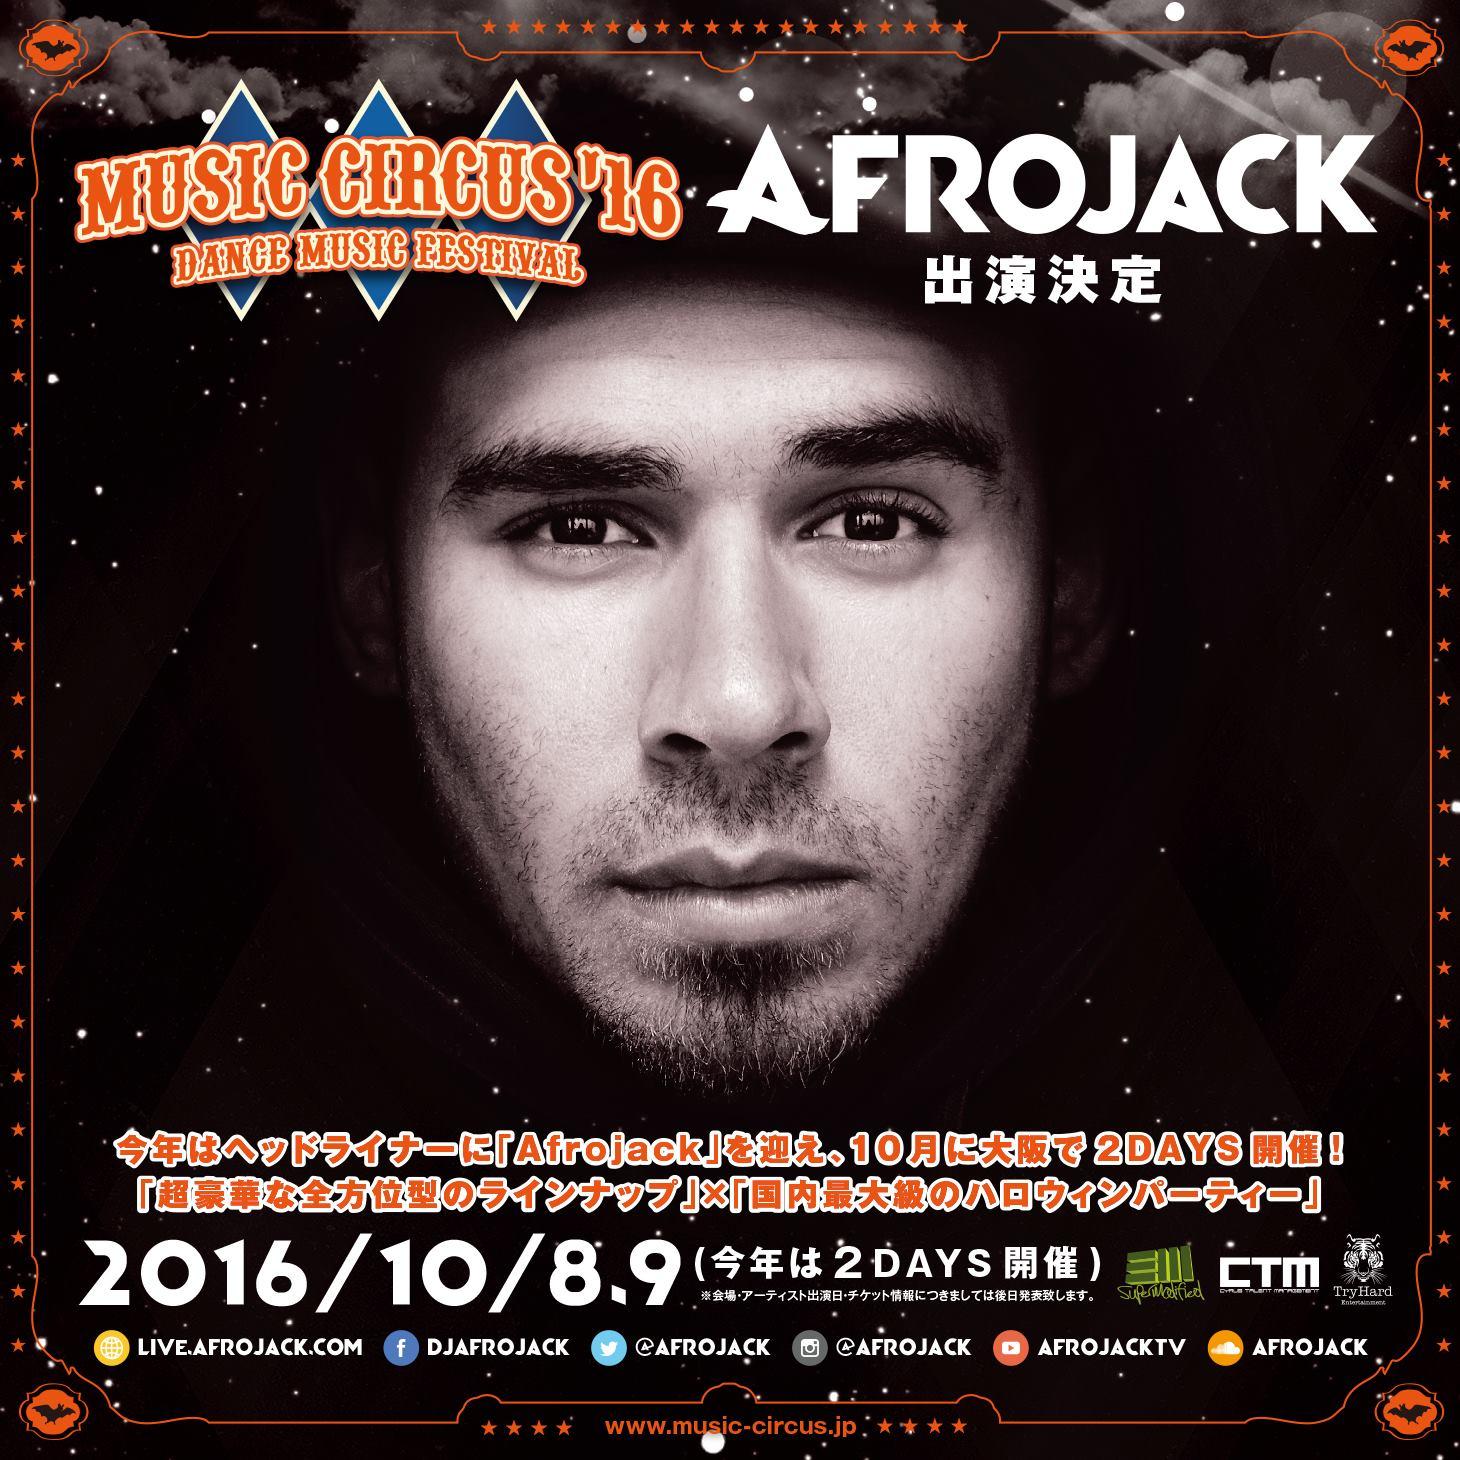 MUSIC CIRCUS'16 Afrojack